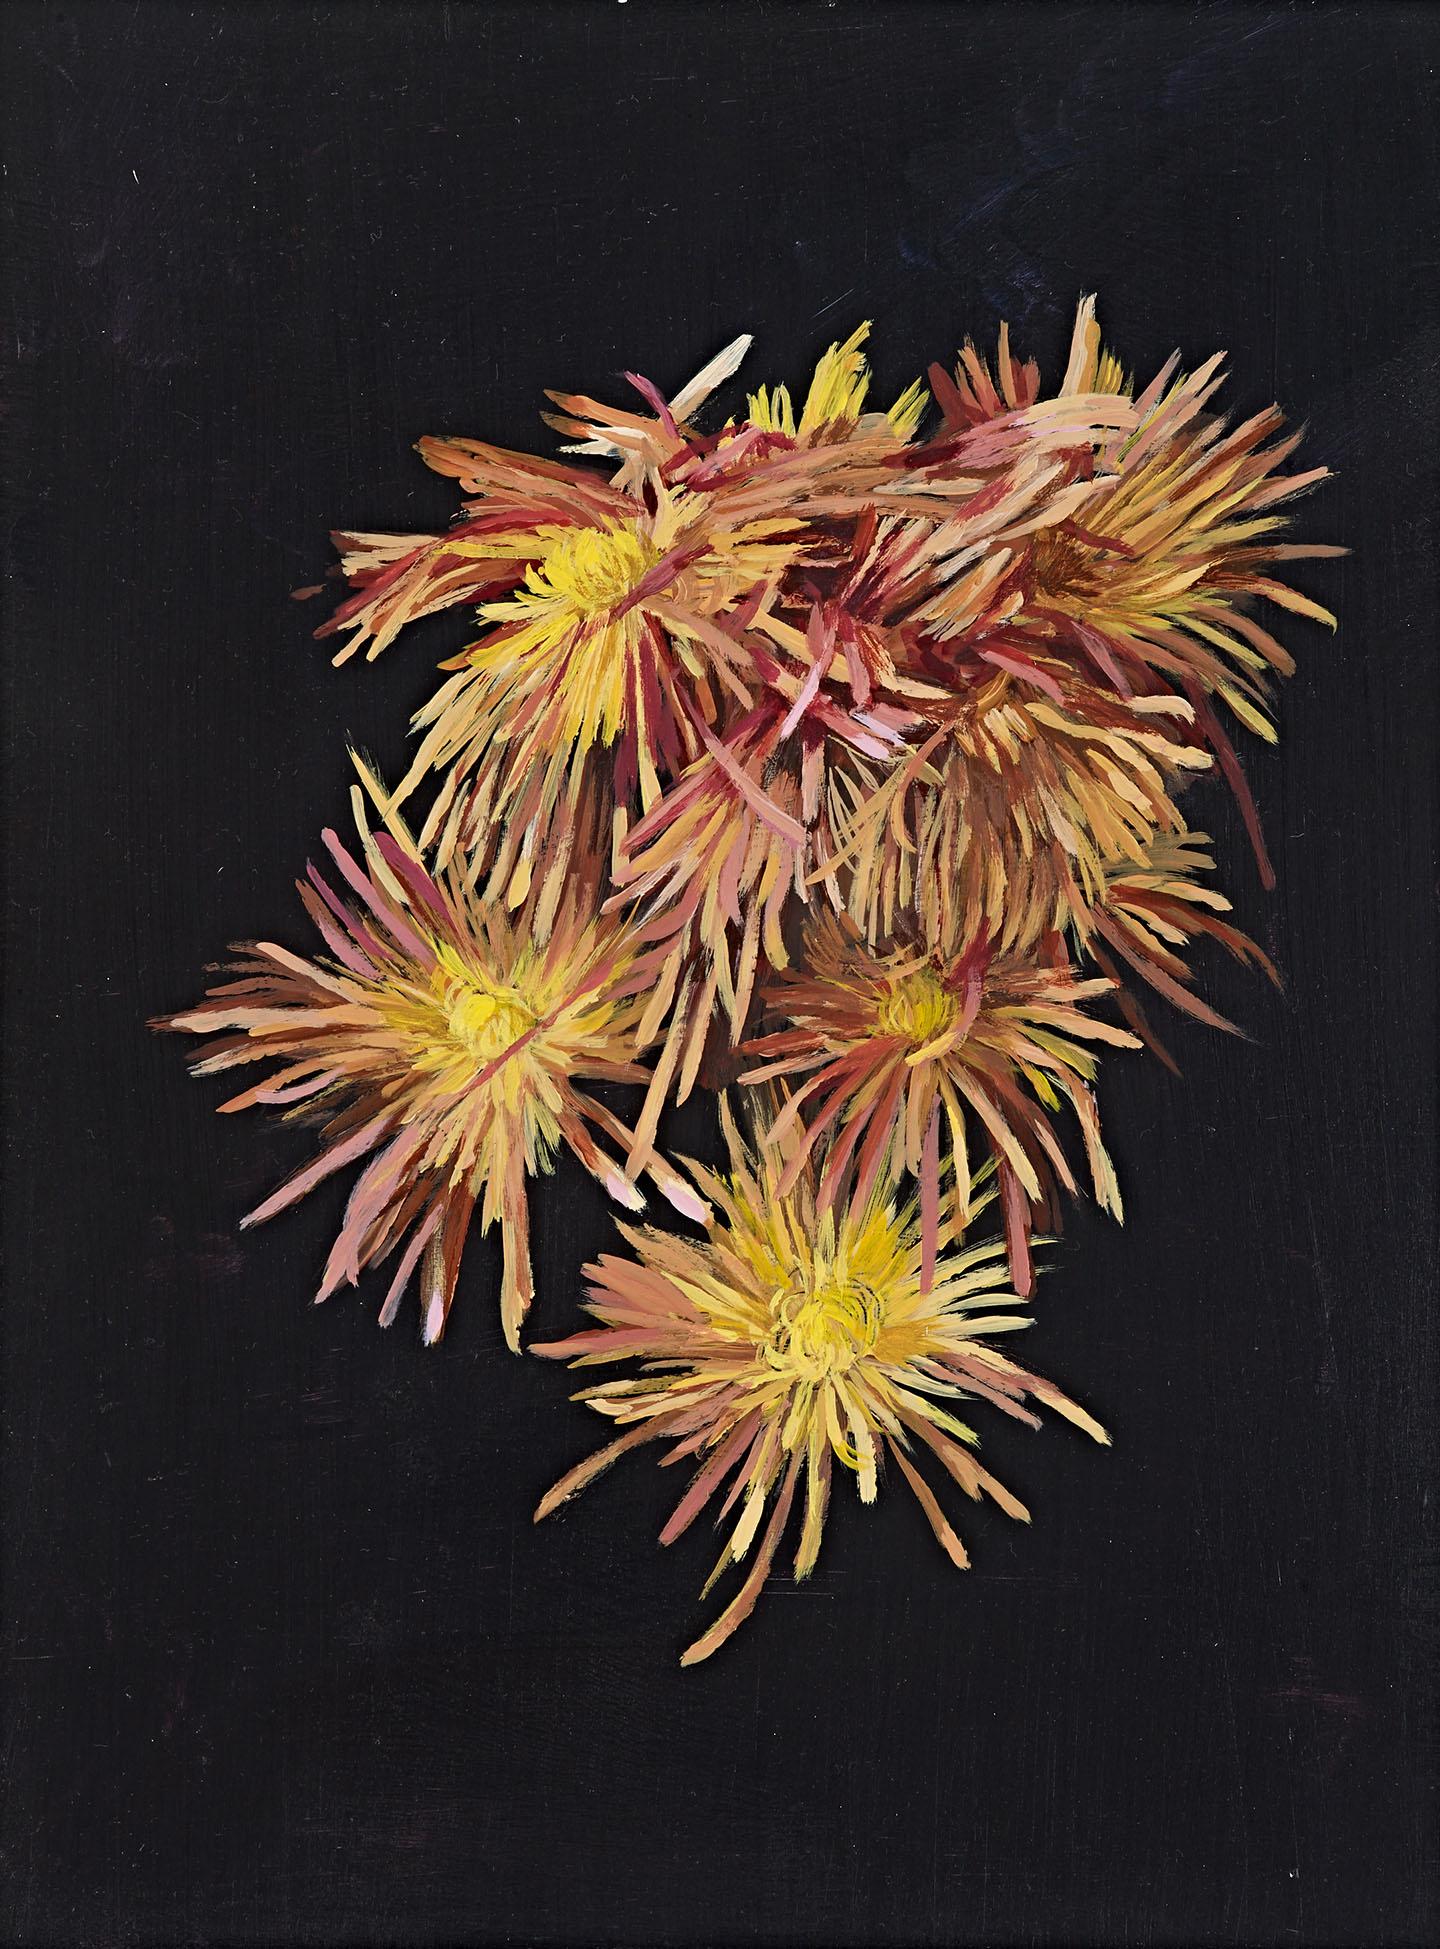 Bradley-chrysanthemums-1440px-wide-3